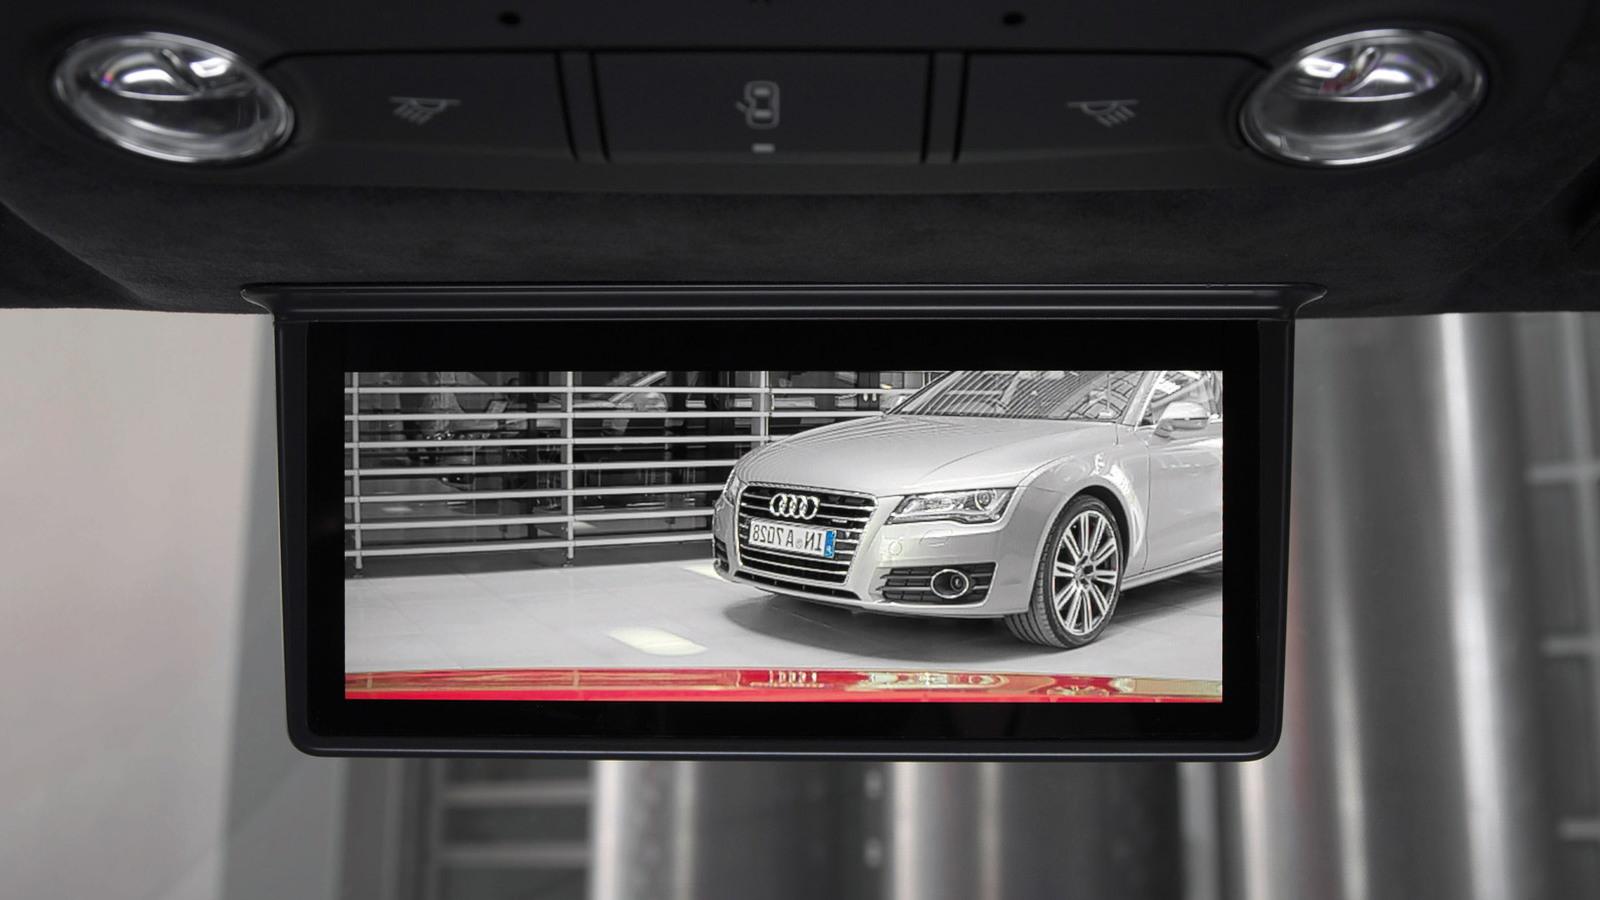 Audi's new digital rear-view mirror, which debuts in the 2013 Audi R8 e-tron